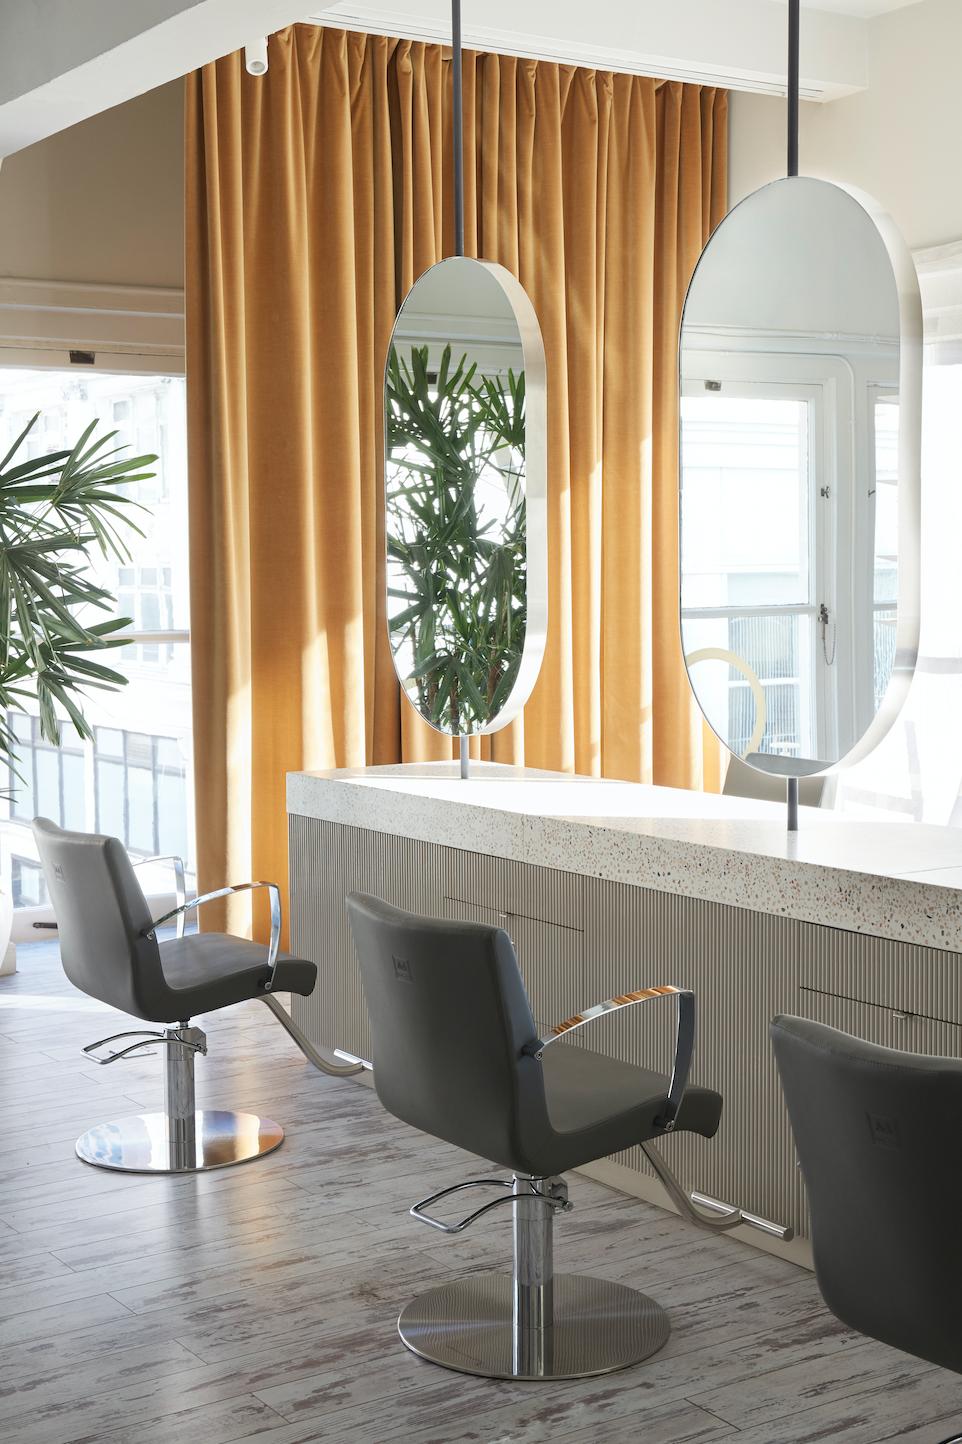 Modern hair salon design with pillshaped mirrors